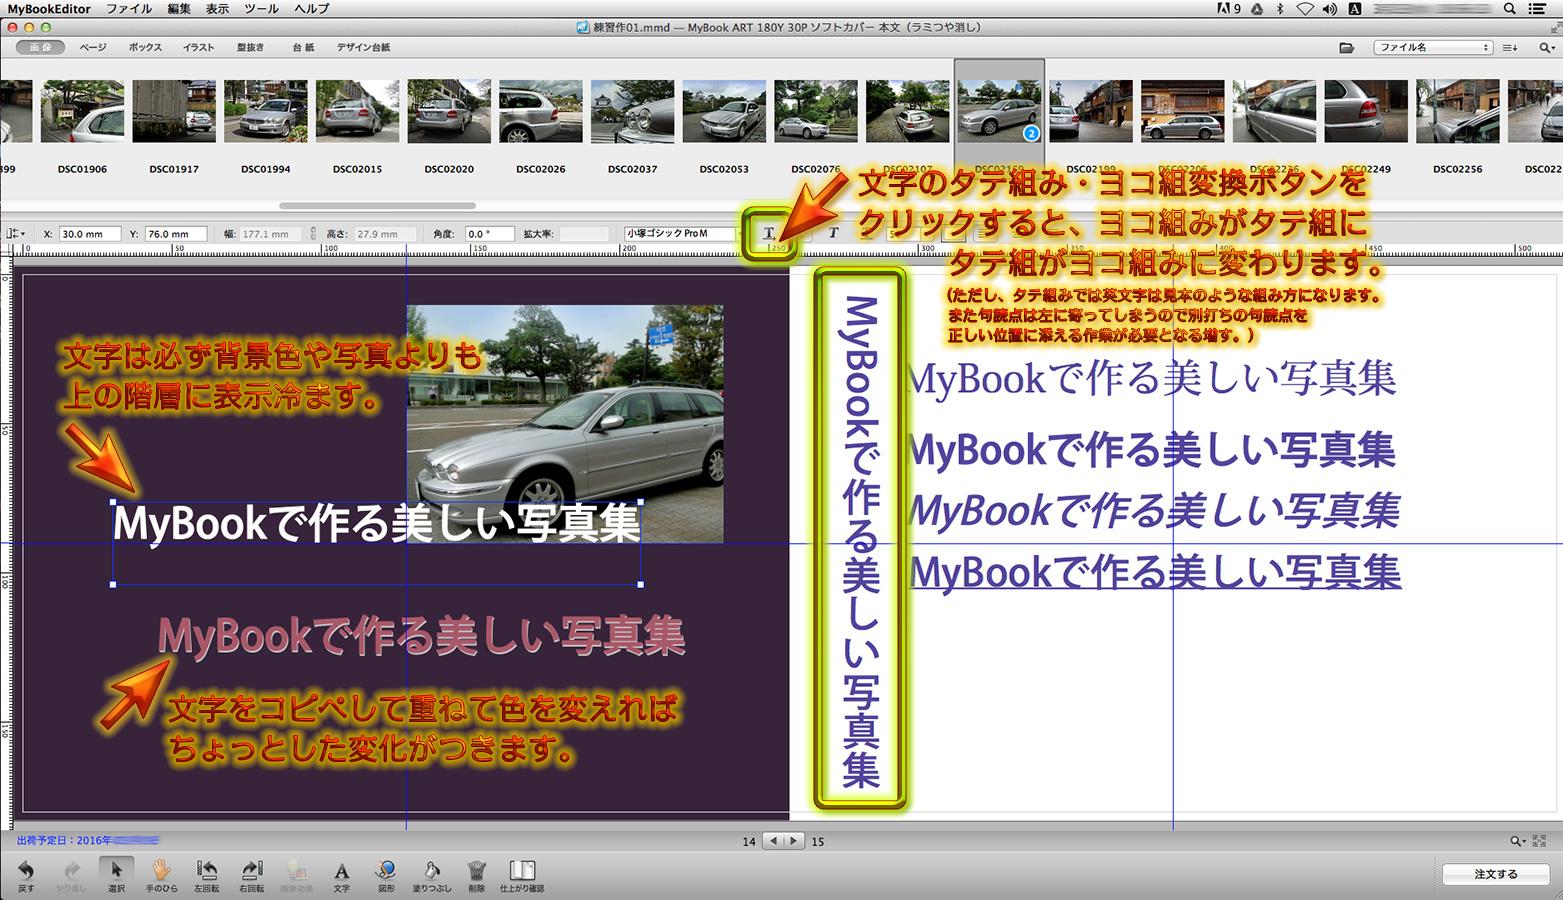 http://moritetsu.info/car/img/mb064-2016-03-02-18-56-13.jpg